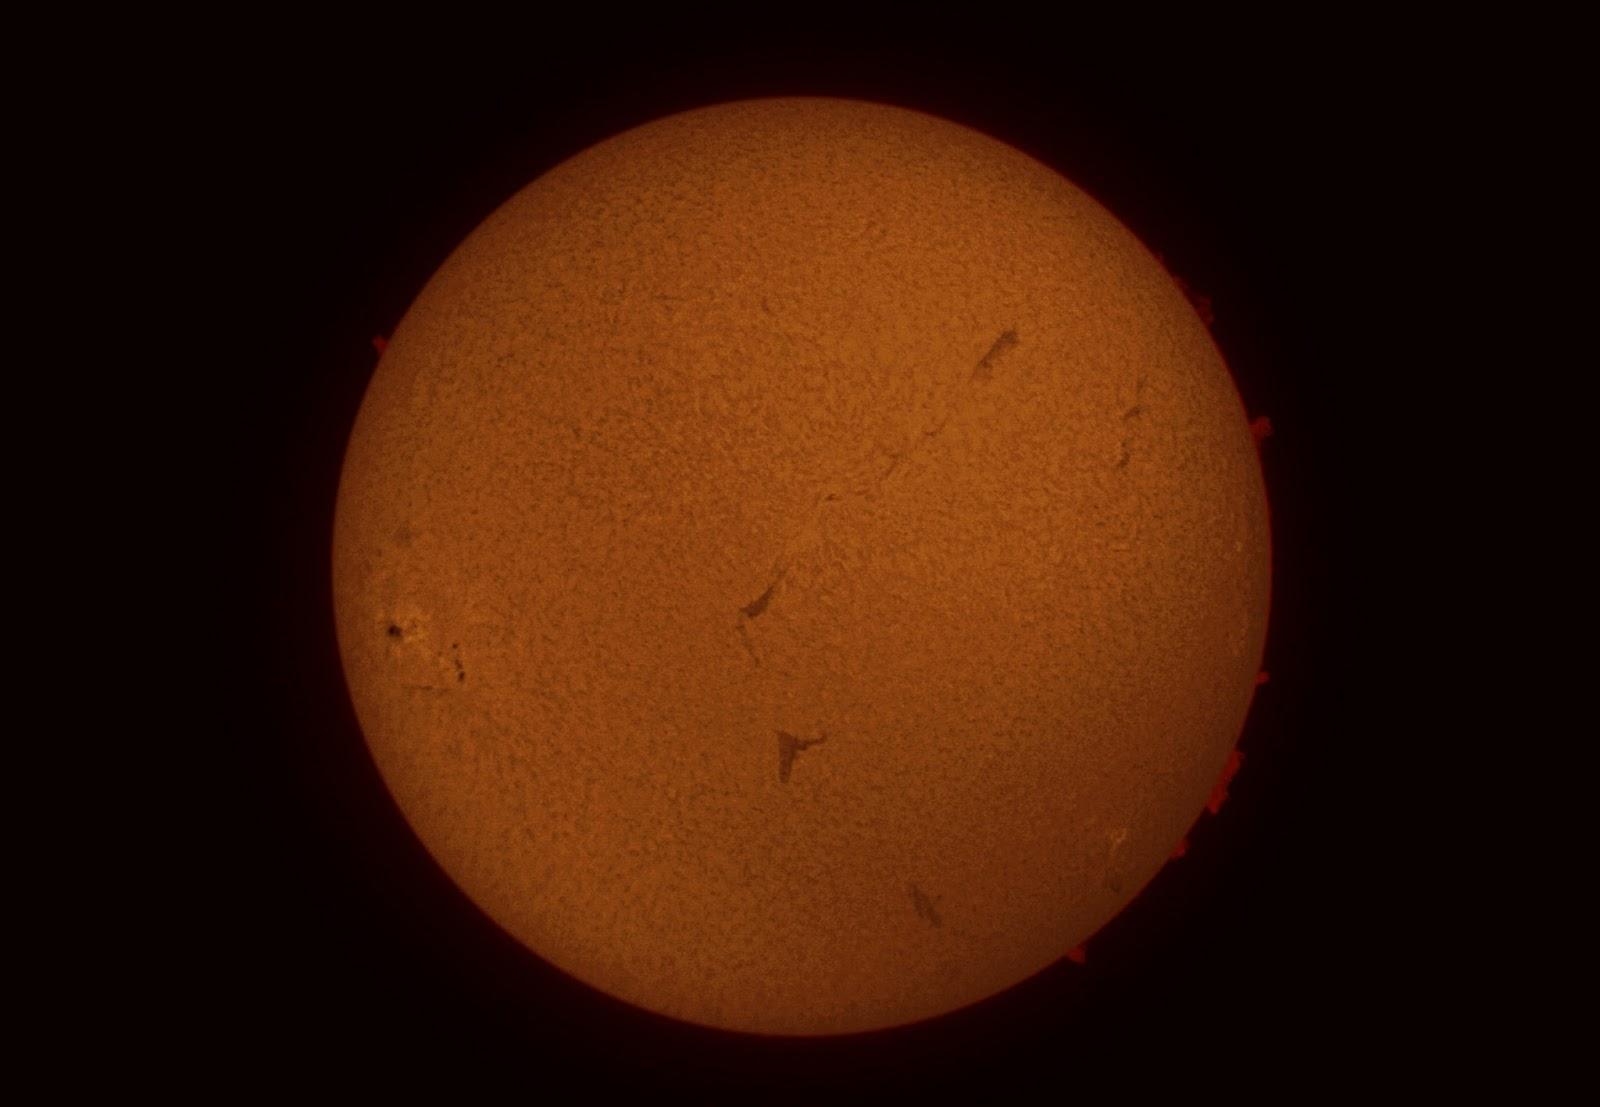 Basic sun information the sun is an average sized star - Basic Sun Information The Sun Is An Average Sized Star 49